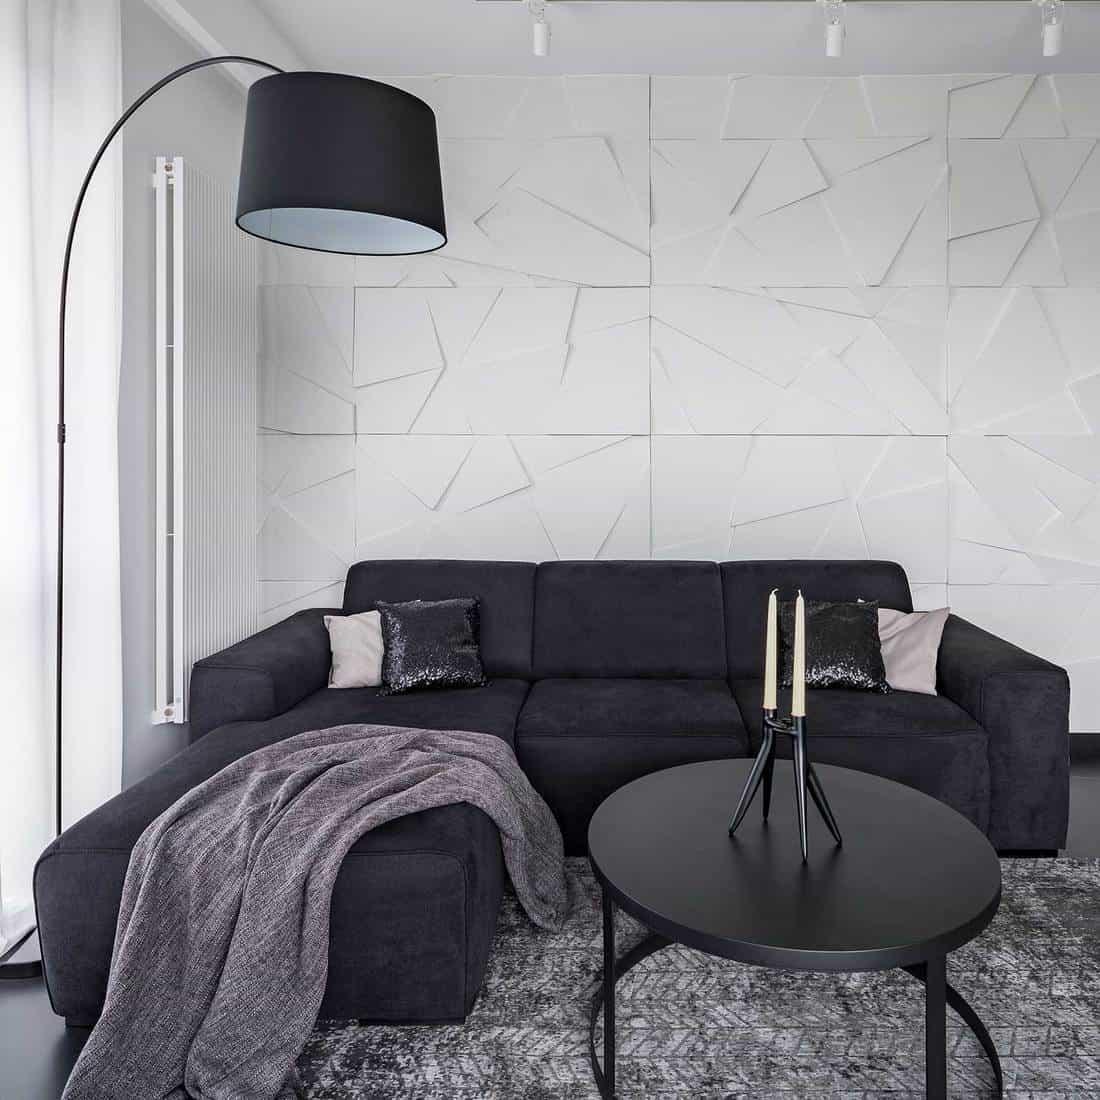 Black corner sofa, coffee table and arc floor lamp in modern apartment